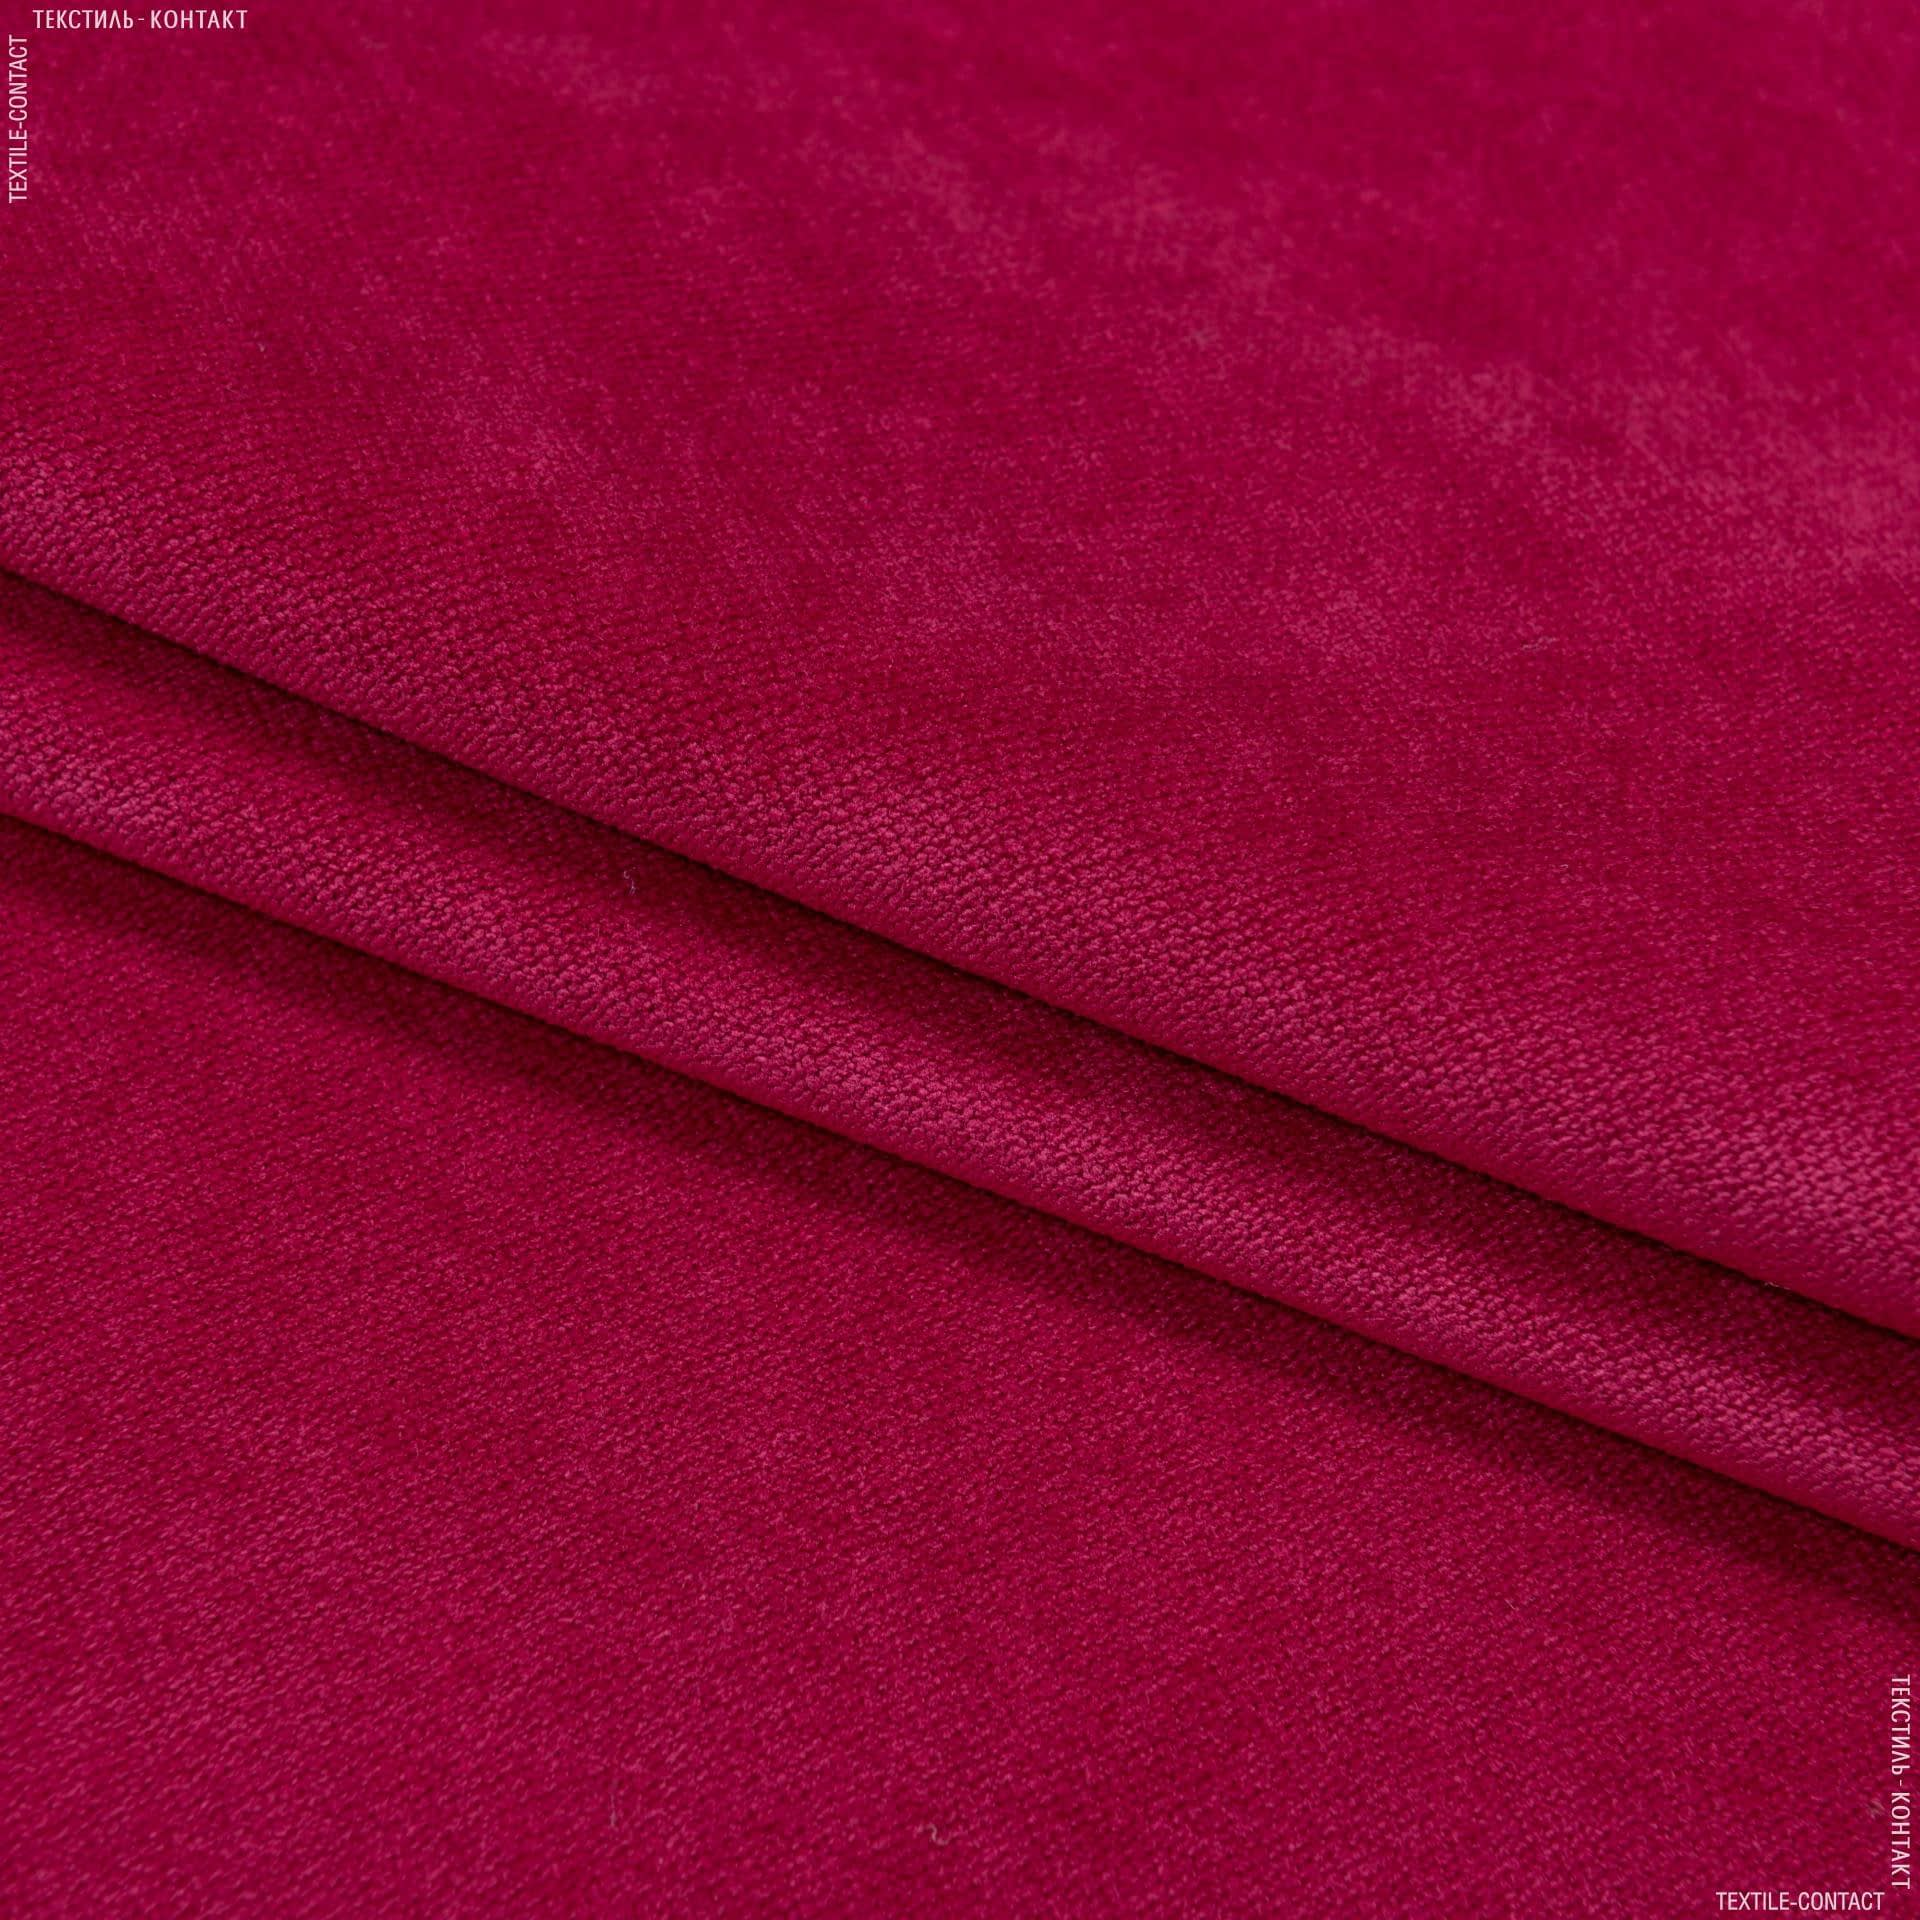 Ткани для мебели - Велюр будапешт/budapest гранат